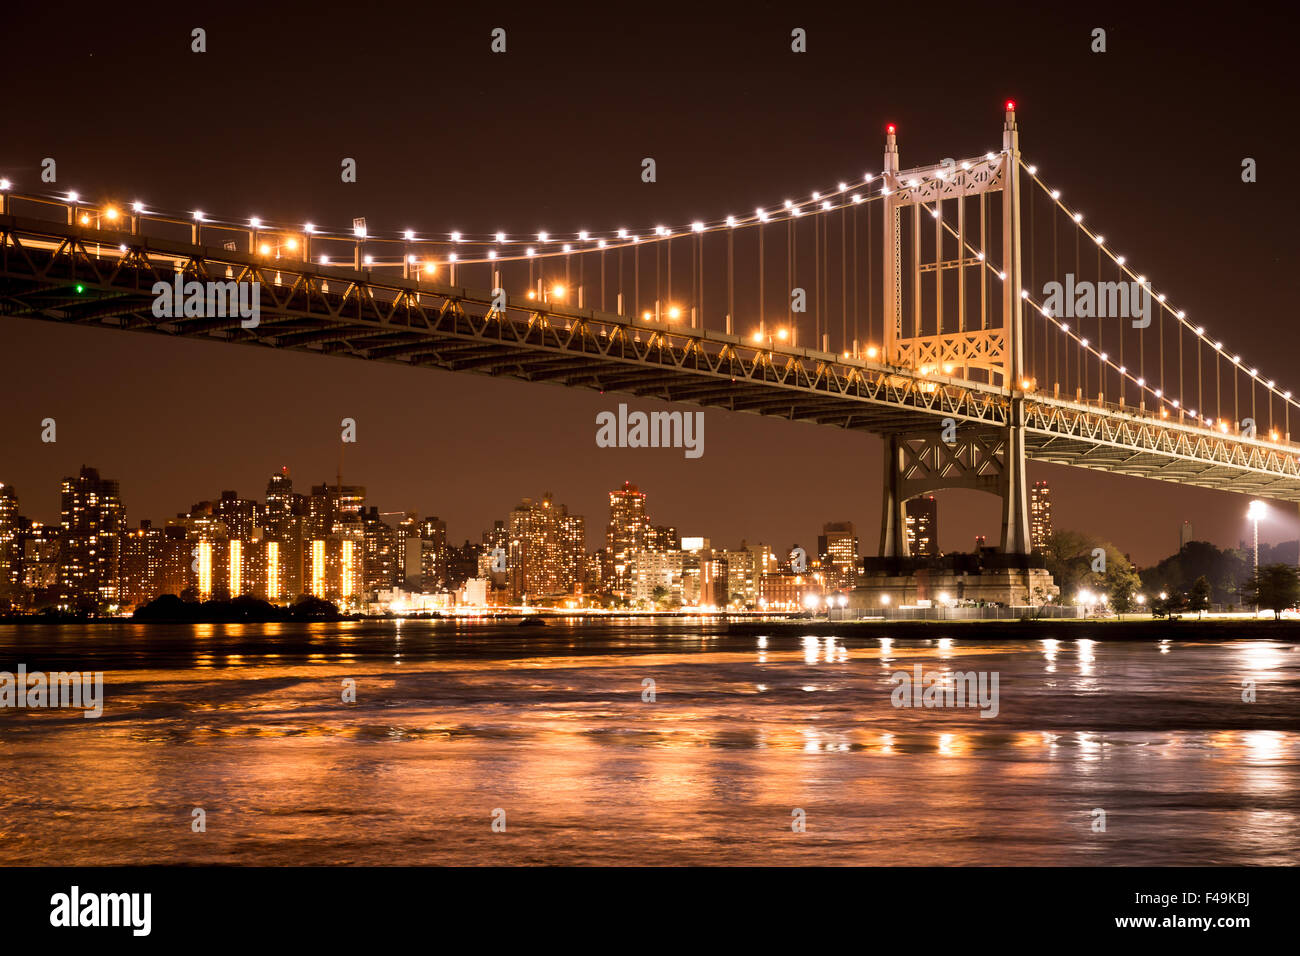 Beautiful view of the Ed Koch Queensboro Bridge in New York City looking towards Manhattan at night - Stock Image